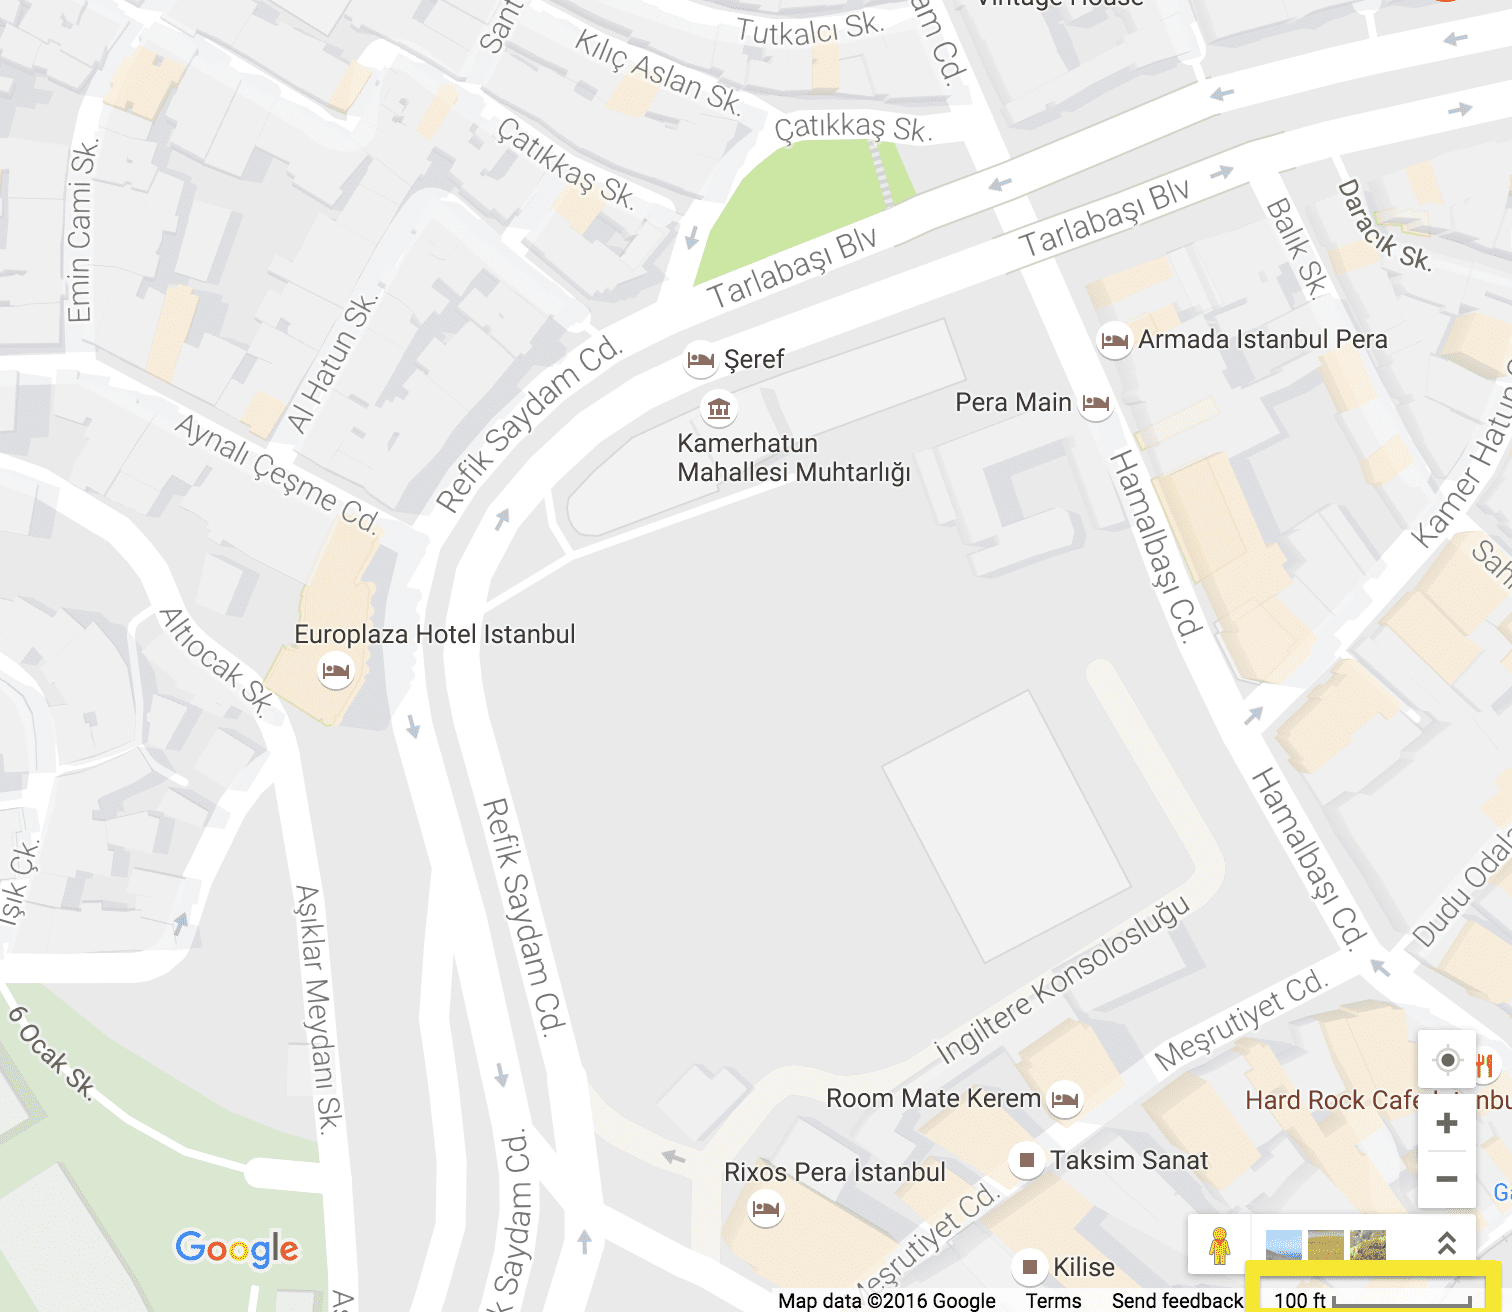 Istanbul - Google Mapsv1